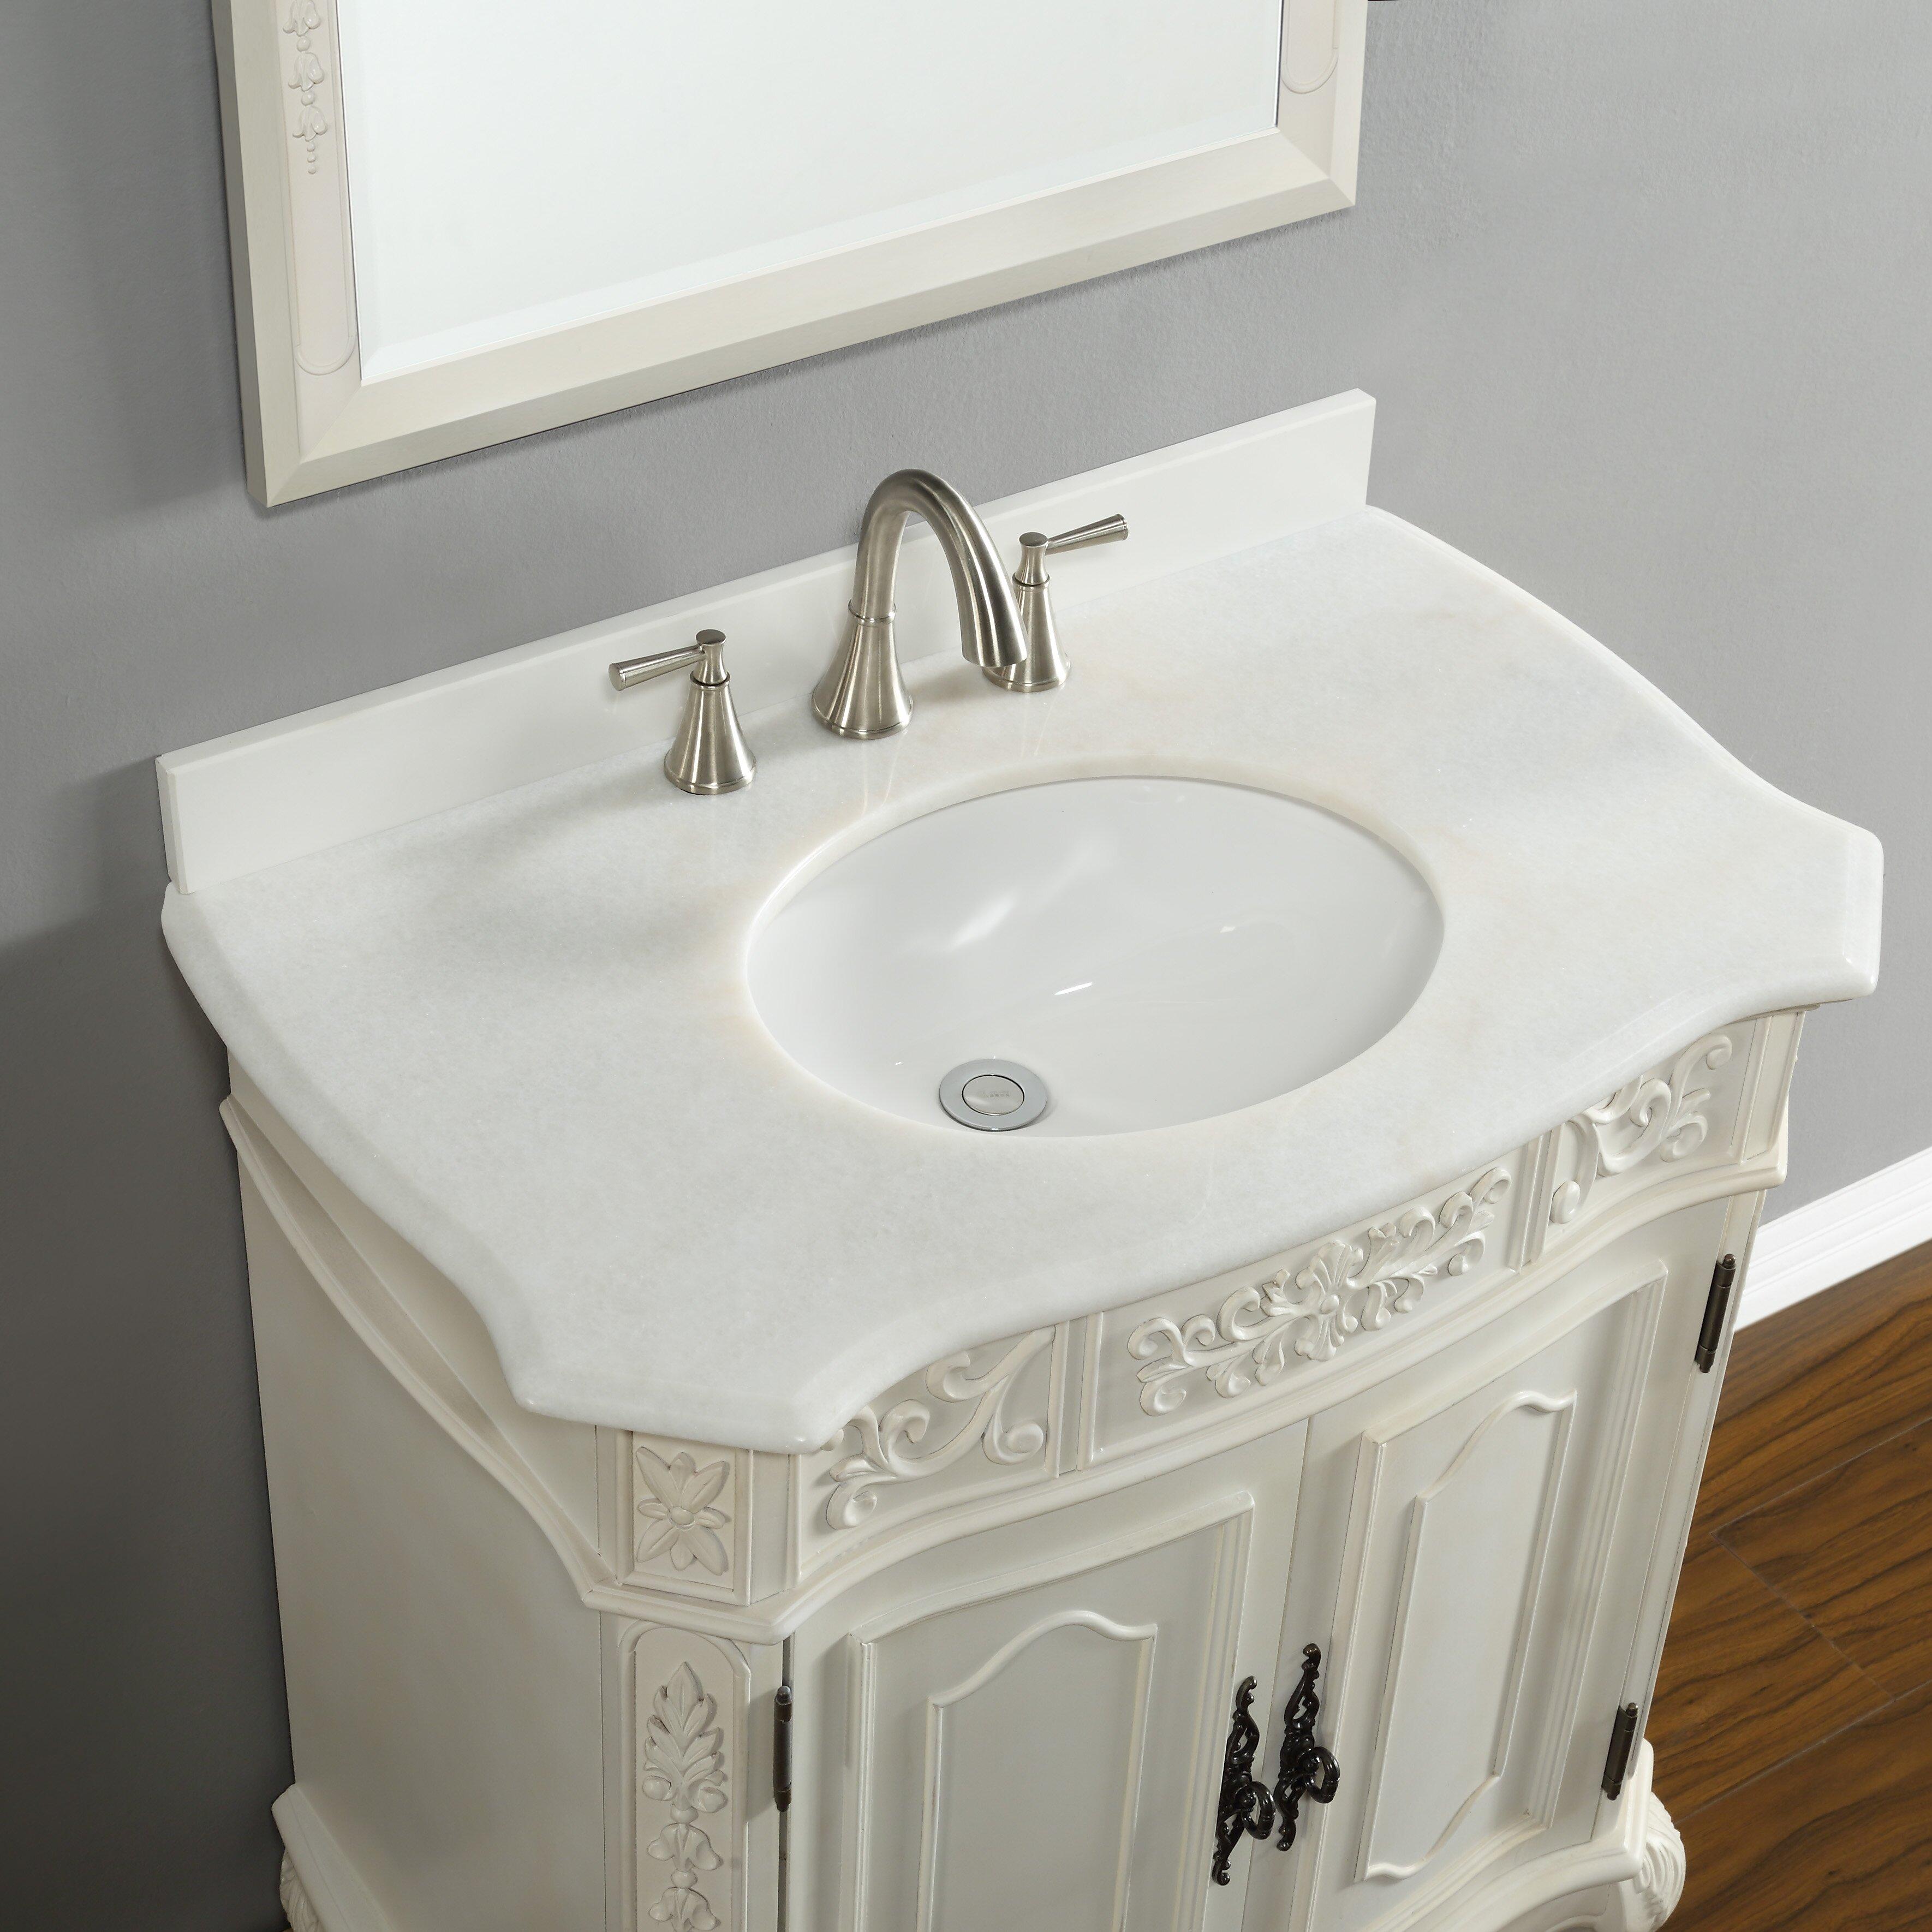 Mission hills rutherford 33 quot single vanity set amp reviews wayfair - Mission Hills Bathroom Vanity Mission Hills Rutherford 33 Quot Single Bathroom Vanity Set